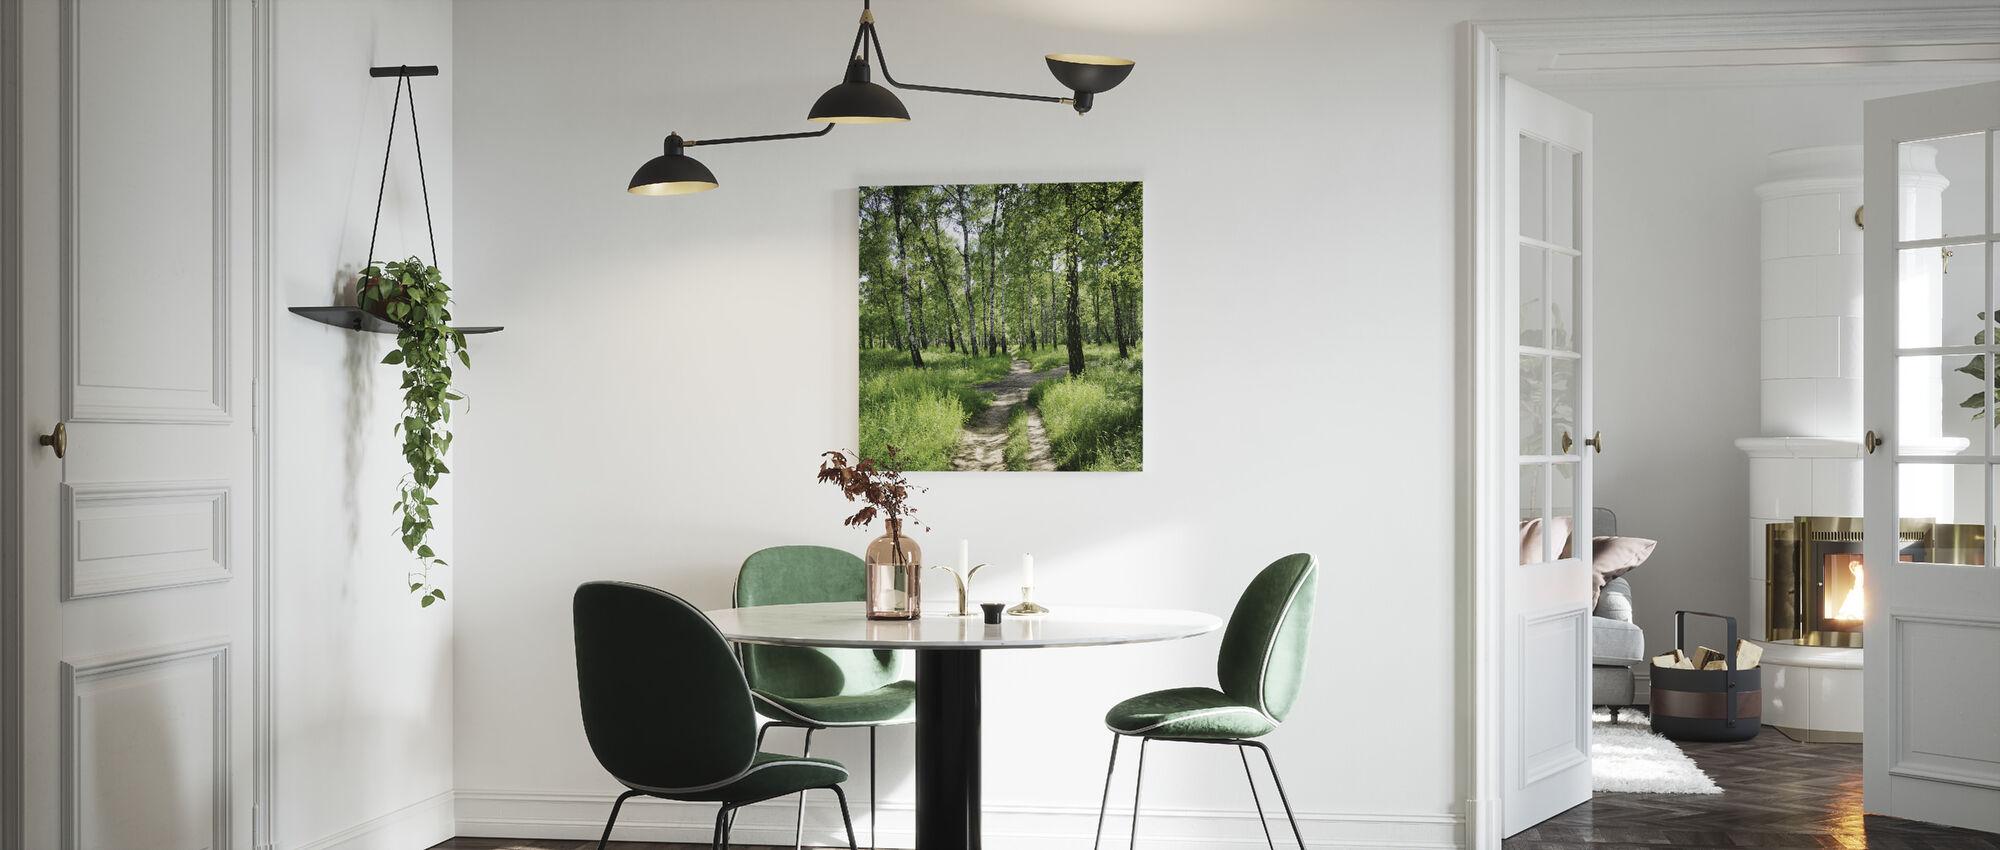 Berkenbos op zonnige dag - Canvas print - Keuken